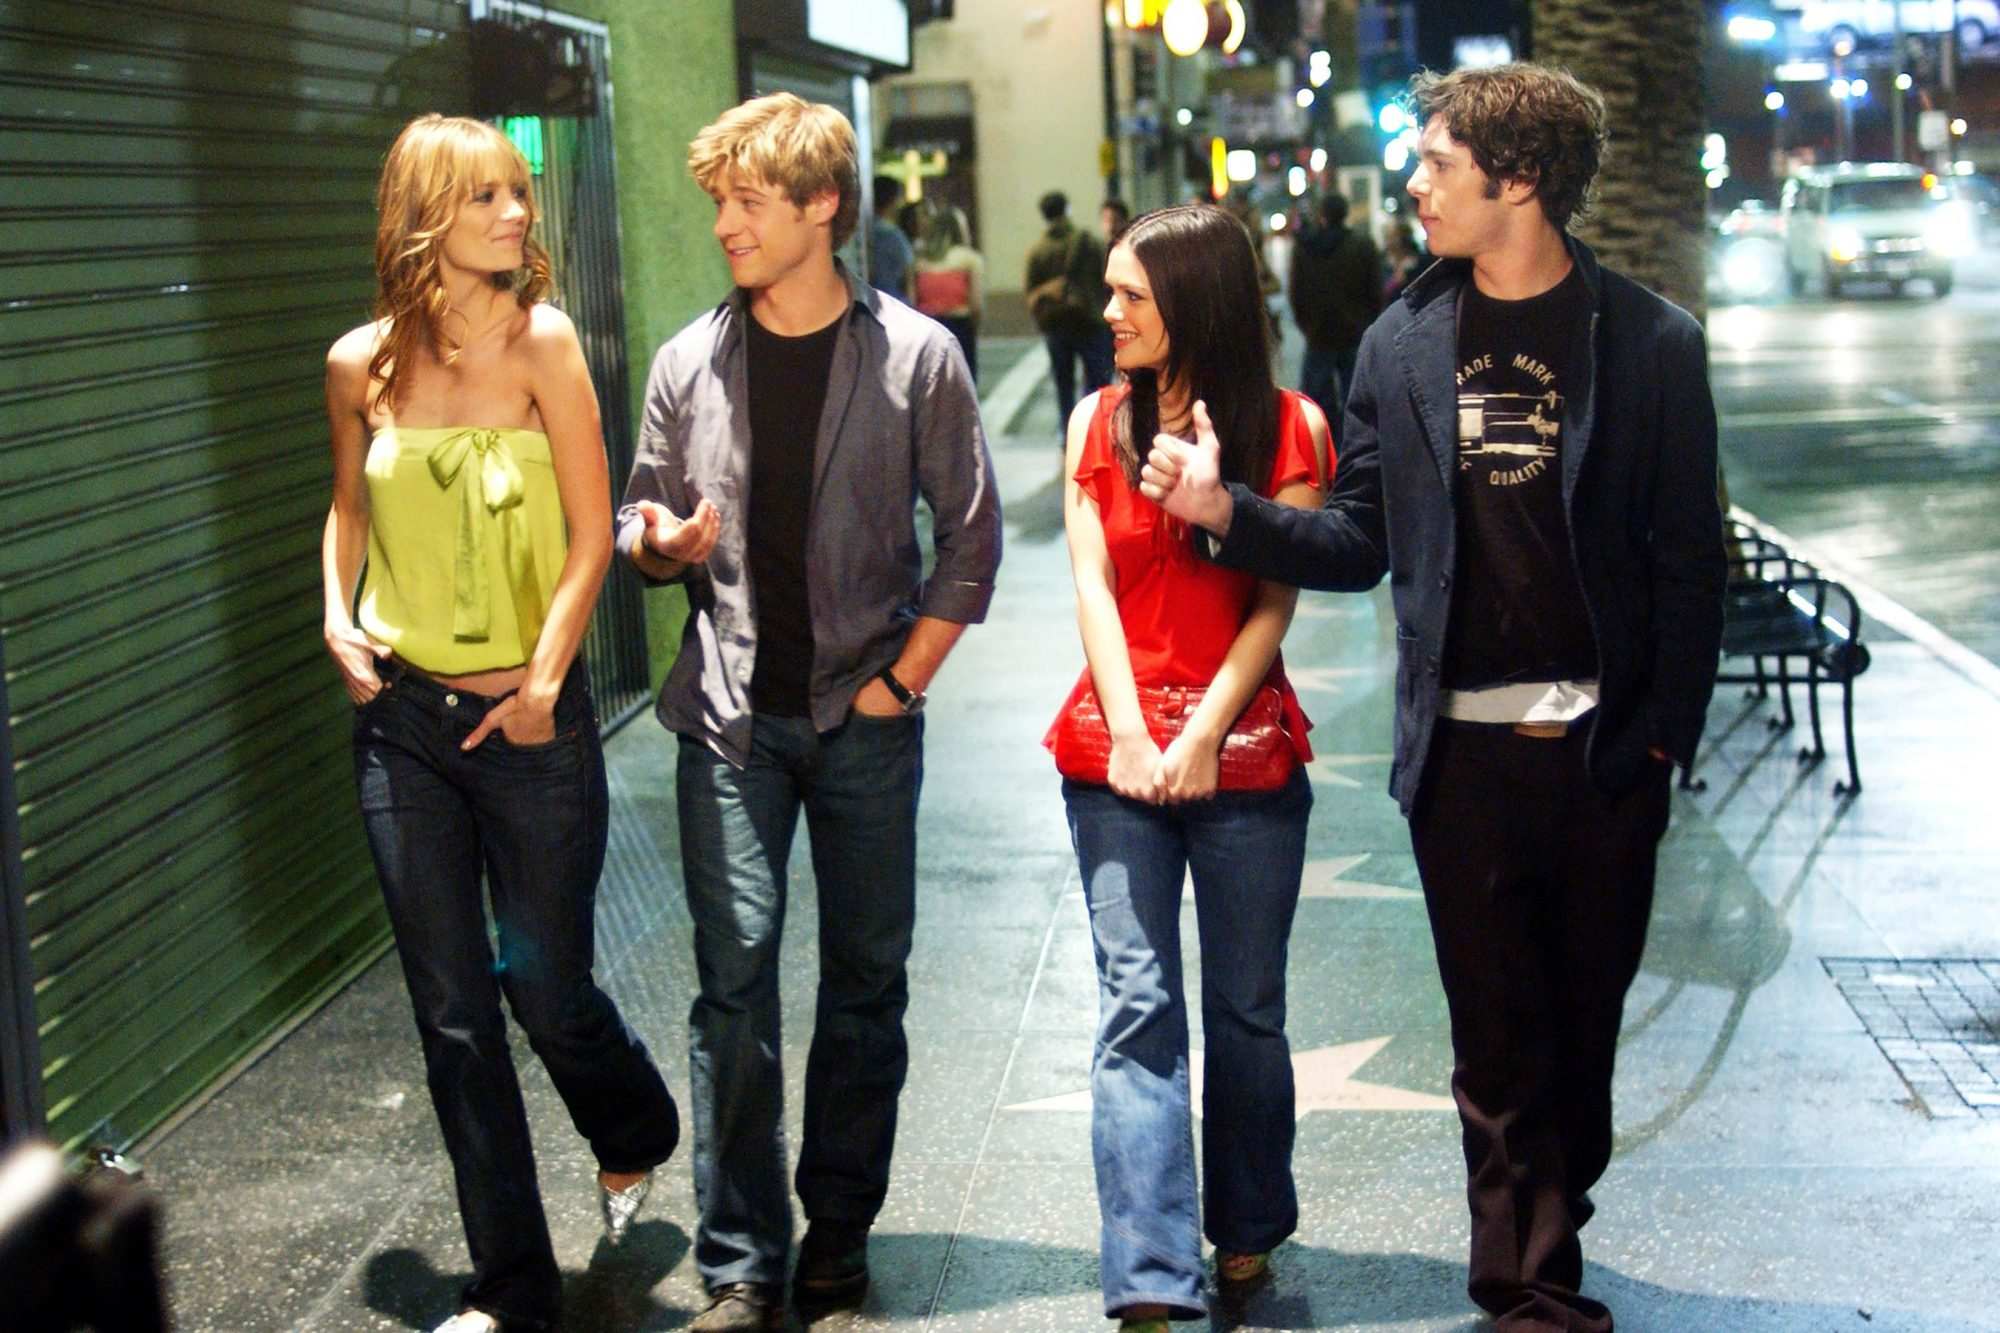 THE O.C., Mischa Barton, Benjamin McKenzie, Rachel Bilson, Adam Brody, 'The LA', (Season 1), 2003-20